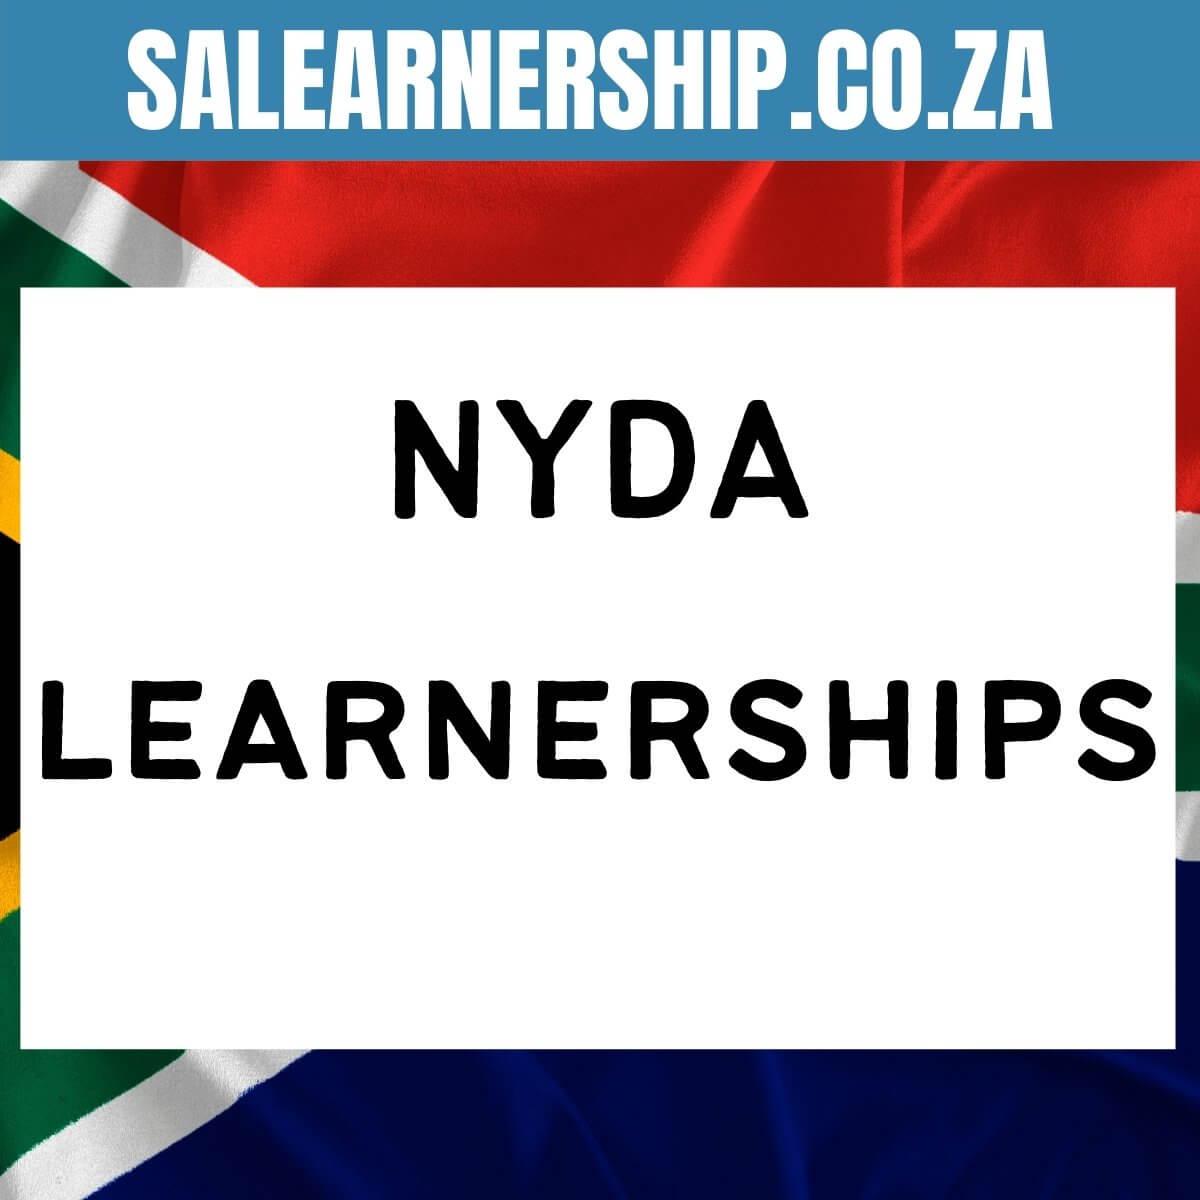 NYDA learnerships